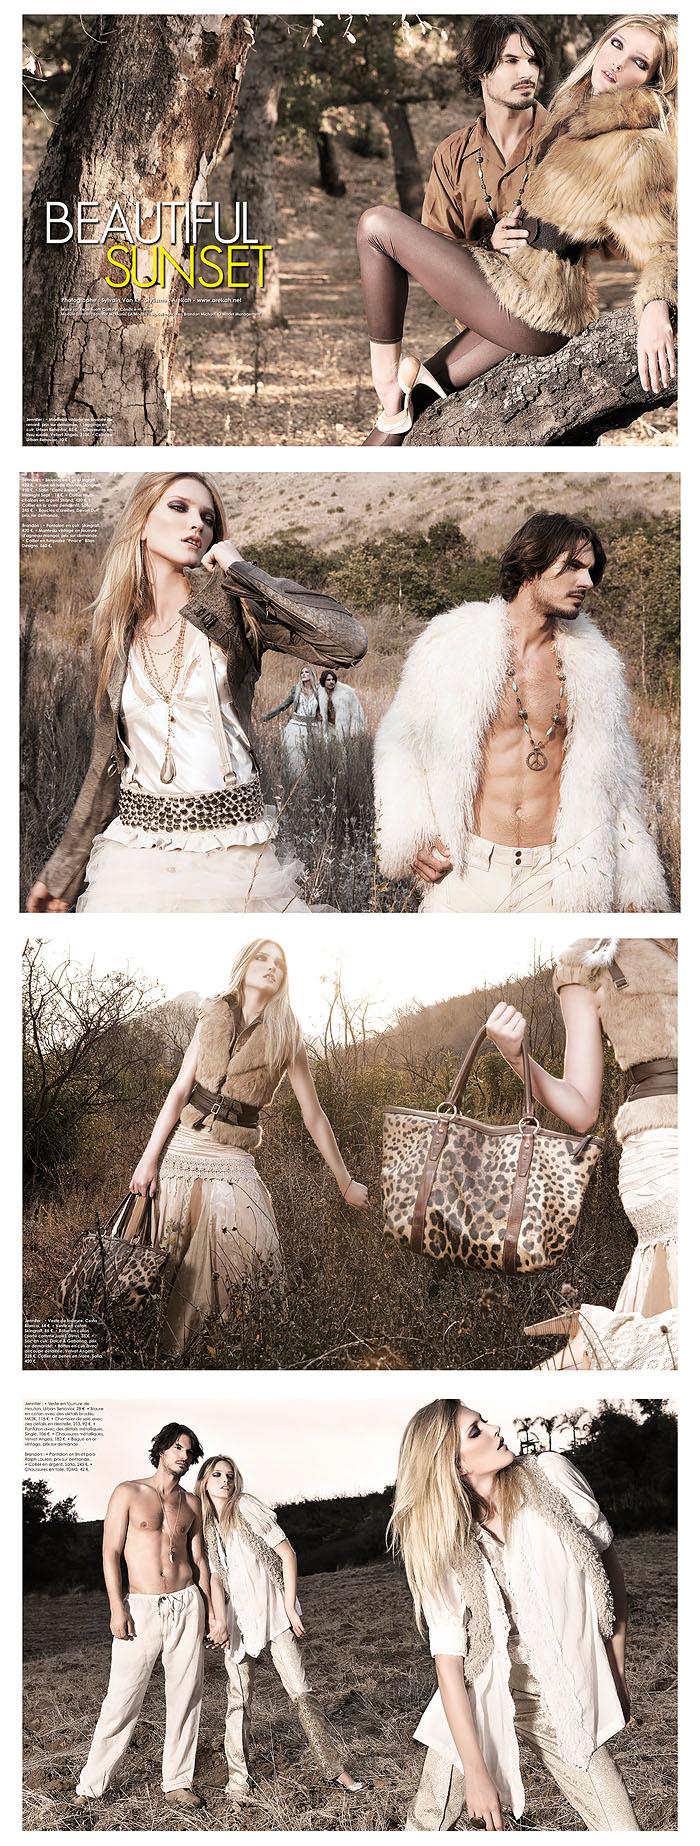 Nov 30, 2009 Sylvan Von K photograher 20ans editorial Sept. | producer/mua bebe booth | wardrobe stylist arekah | hair Candice m. Birns